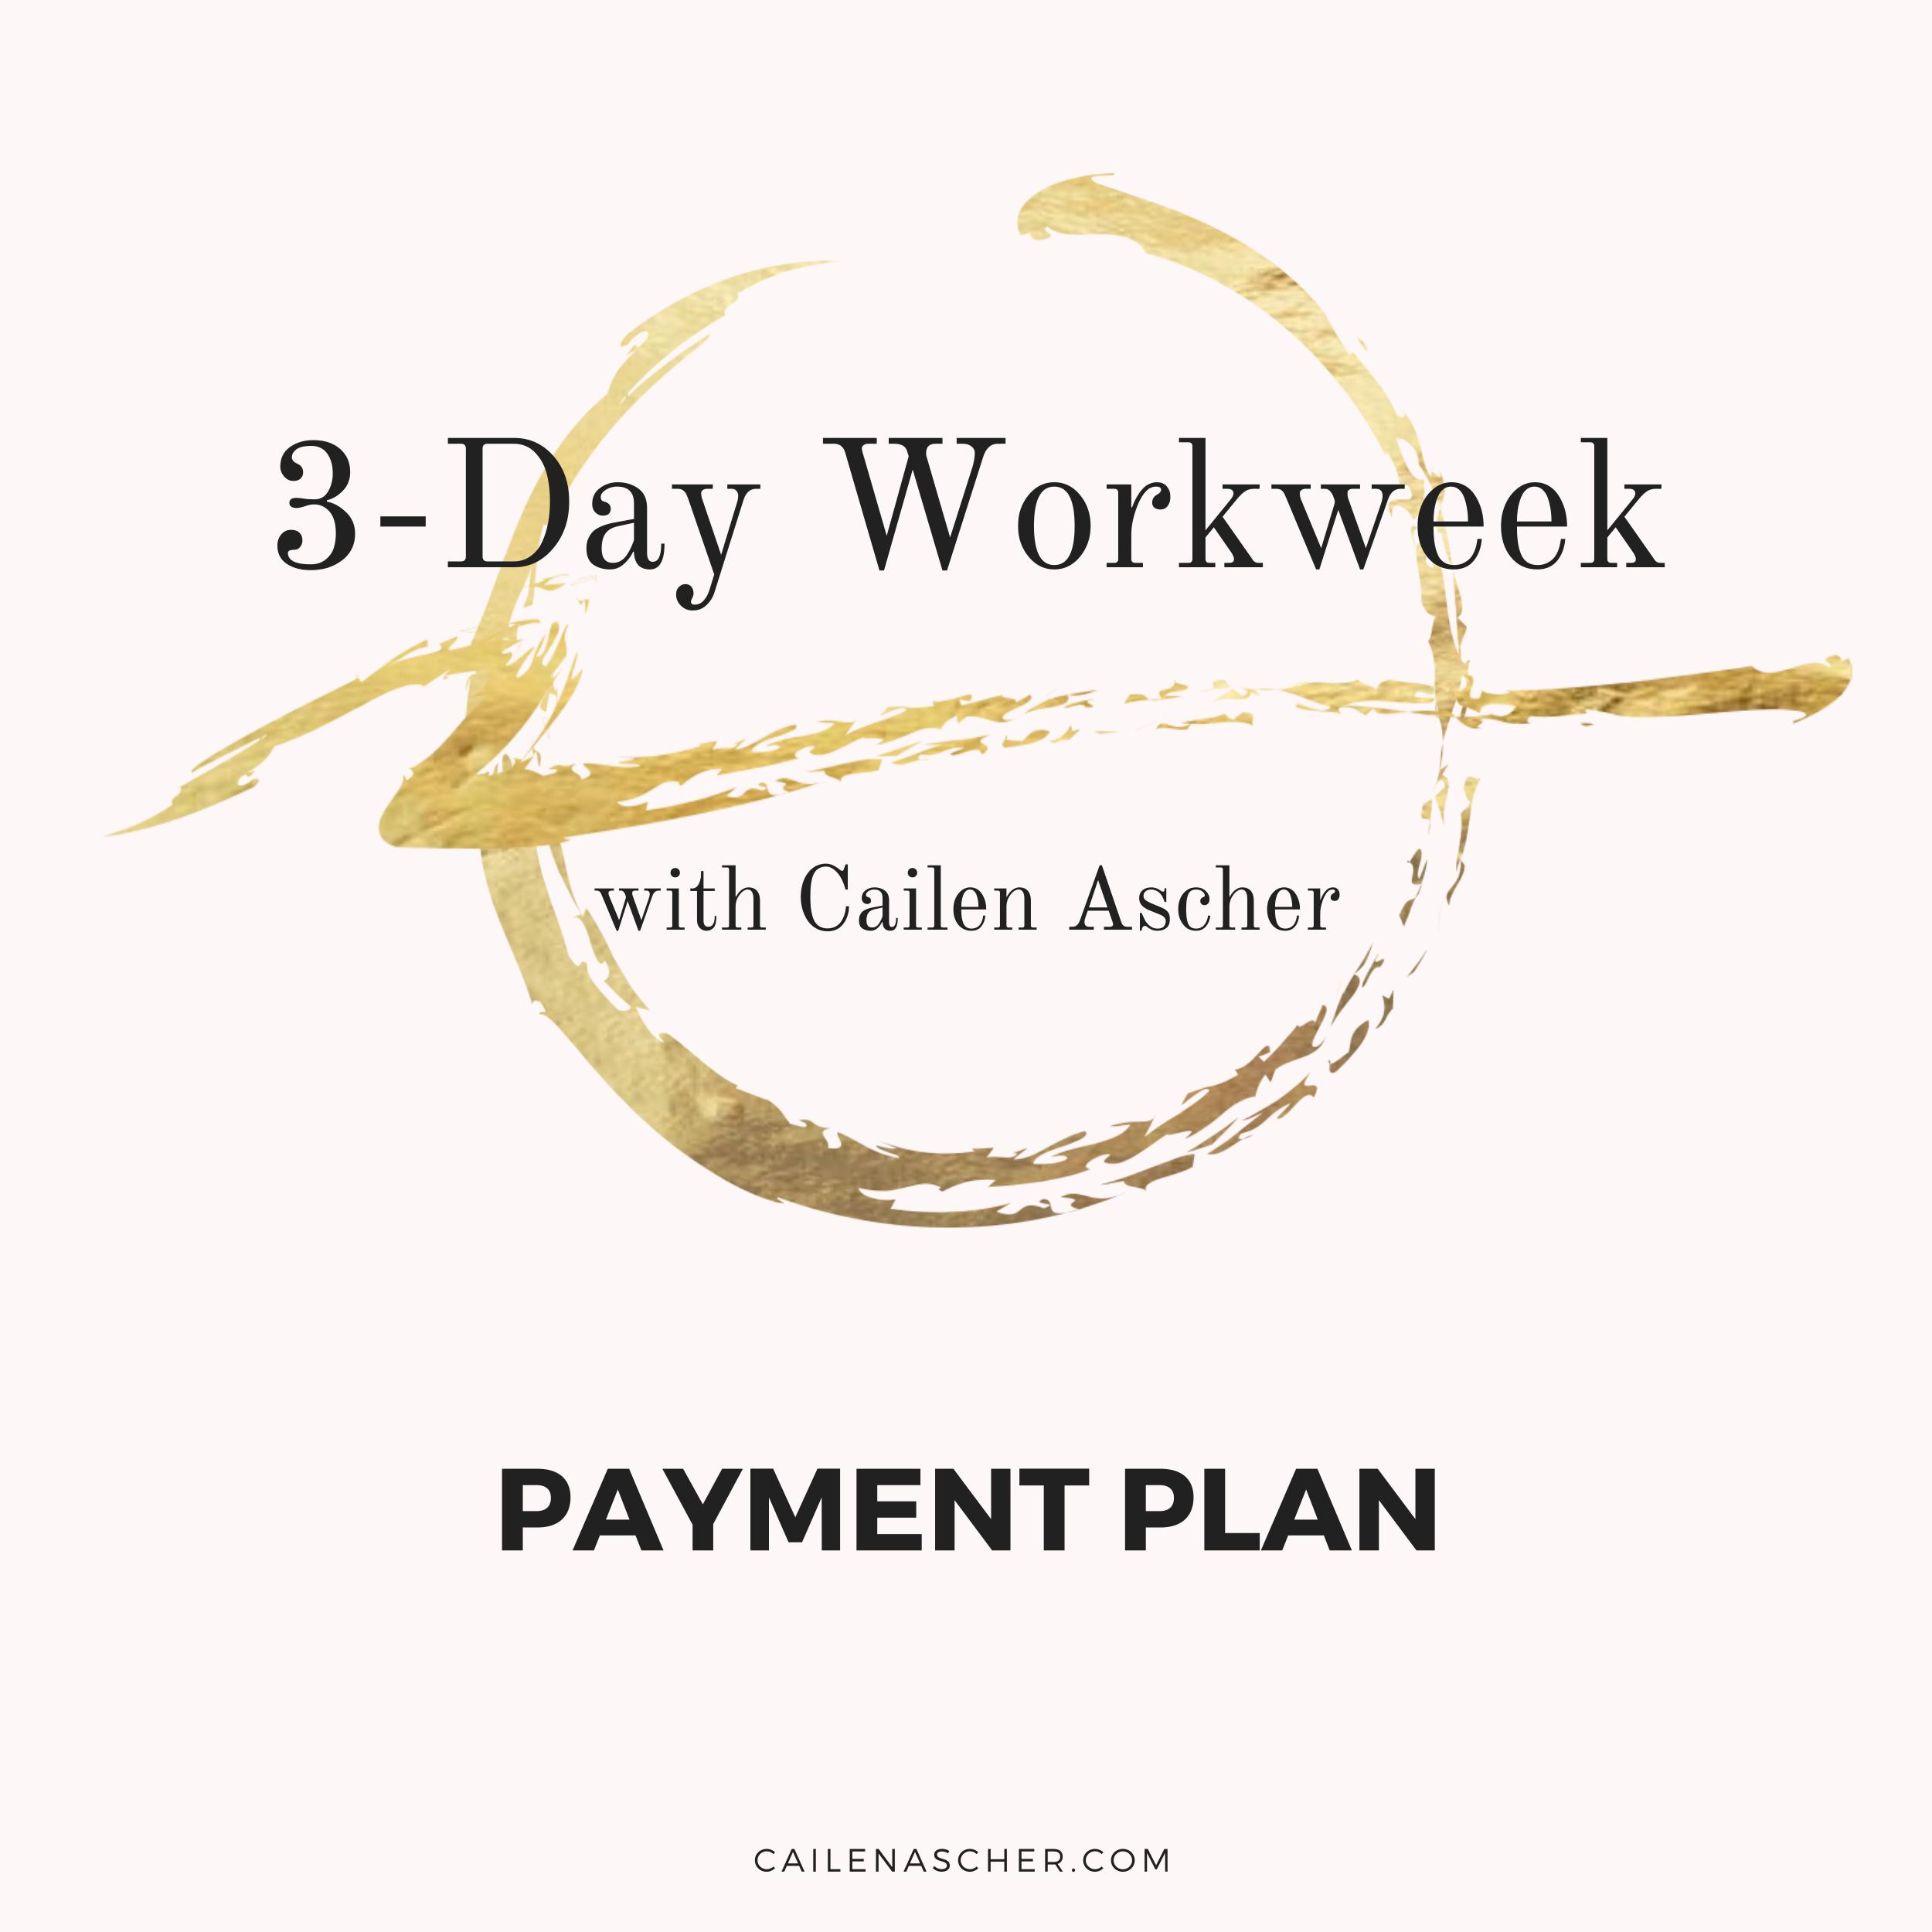 Cailen Ascher - 3-Day Workweek Program - Payment Plan Option Image - LIVE Track Payment Plan.jpg